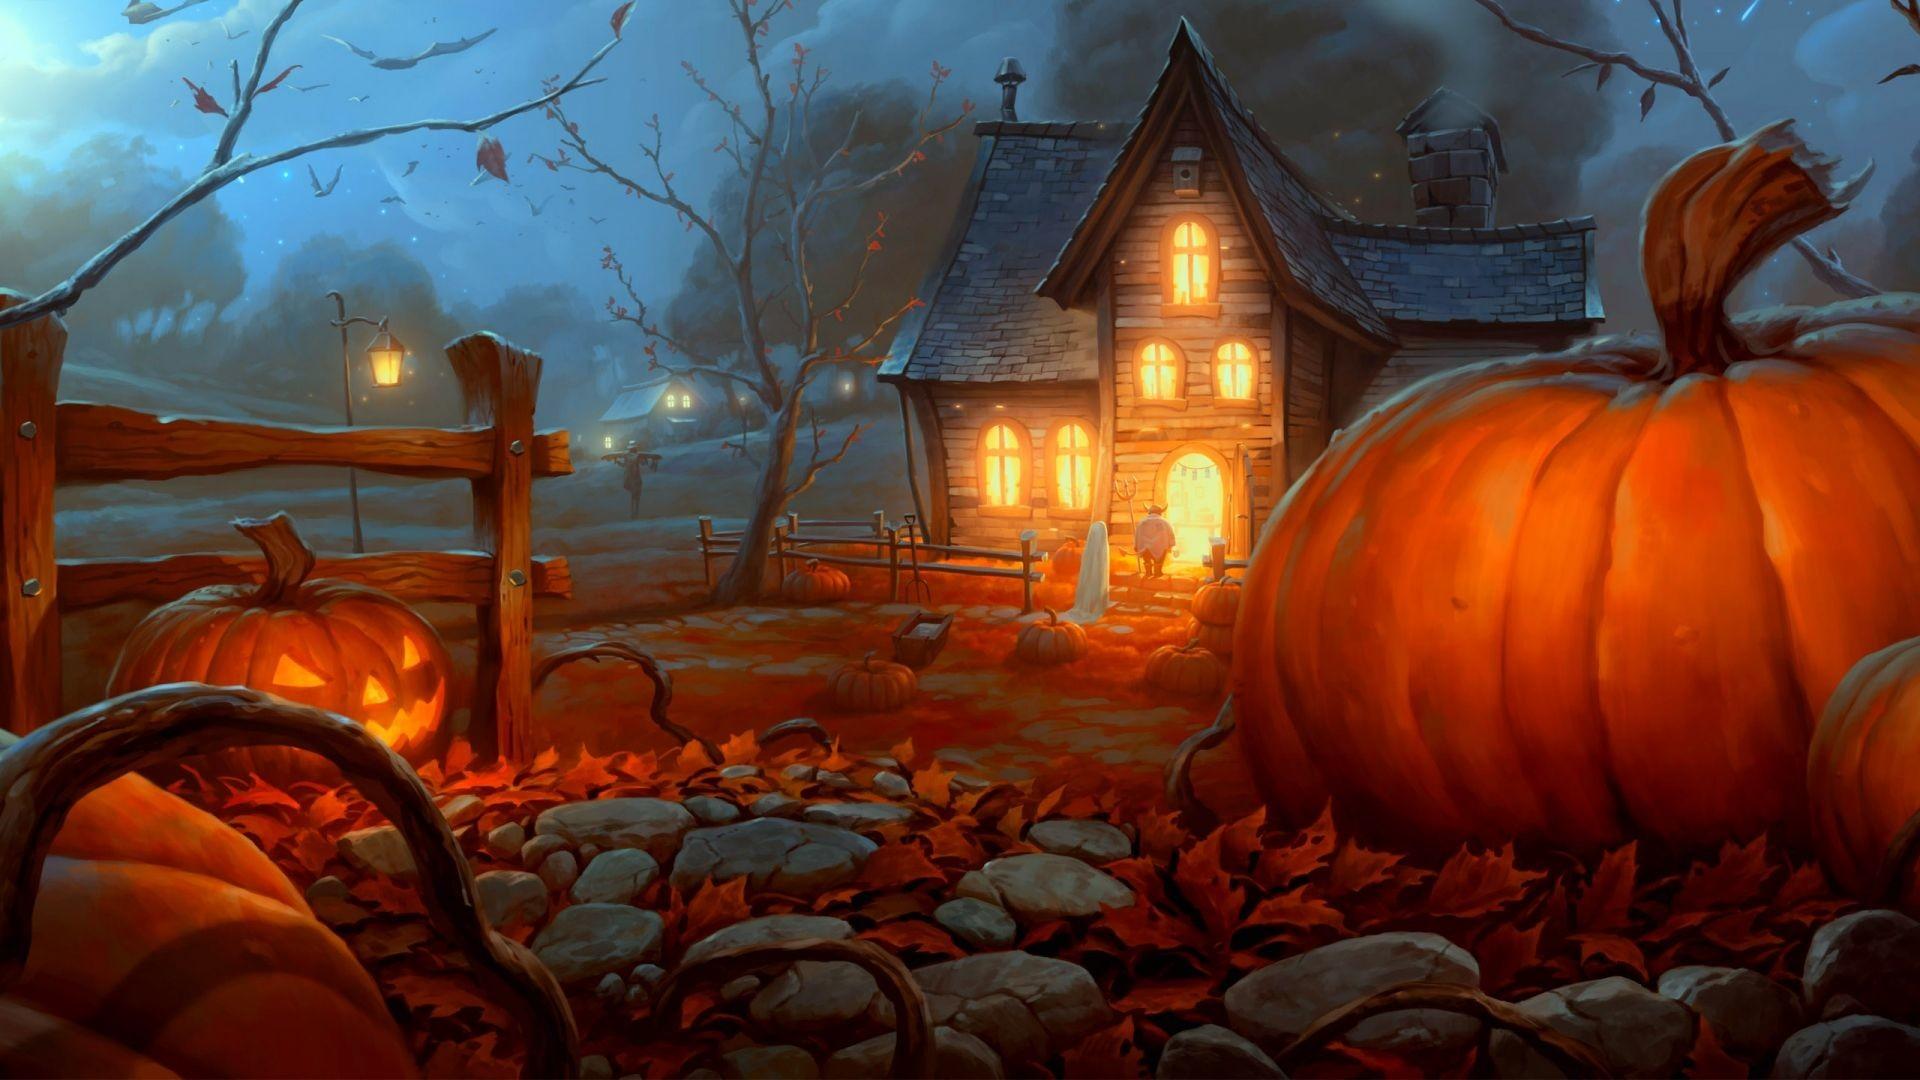 Live Halloween Wallpaper for Desktop 62 images 1920x1080